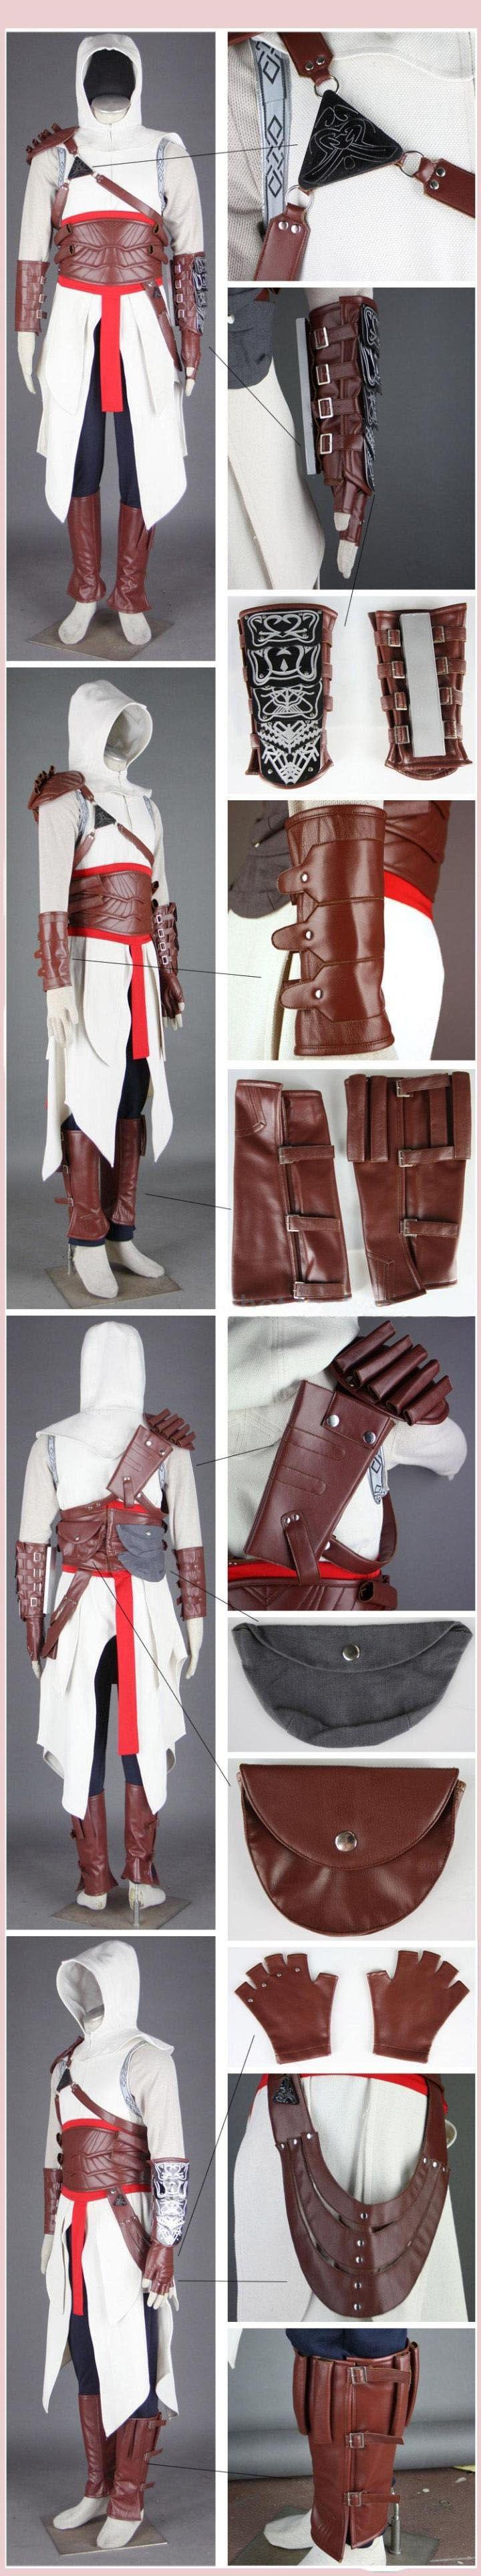 Assassin's Creed Assasin Cosplay Costume